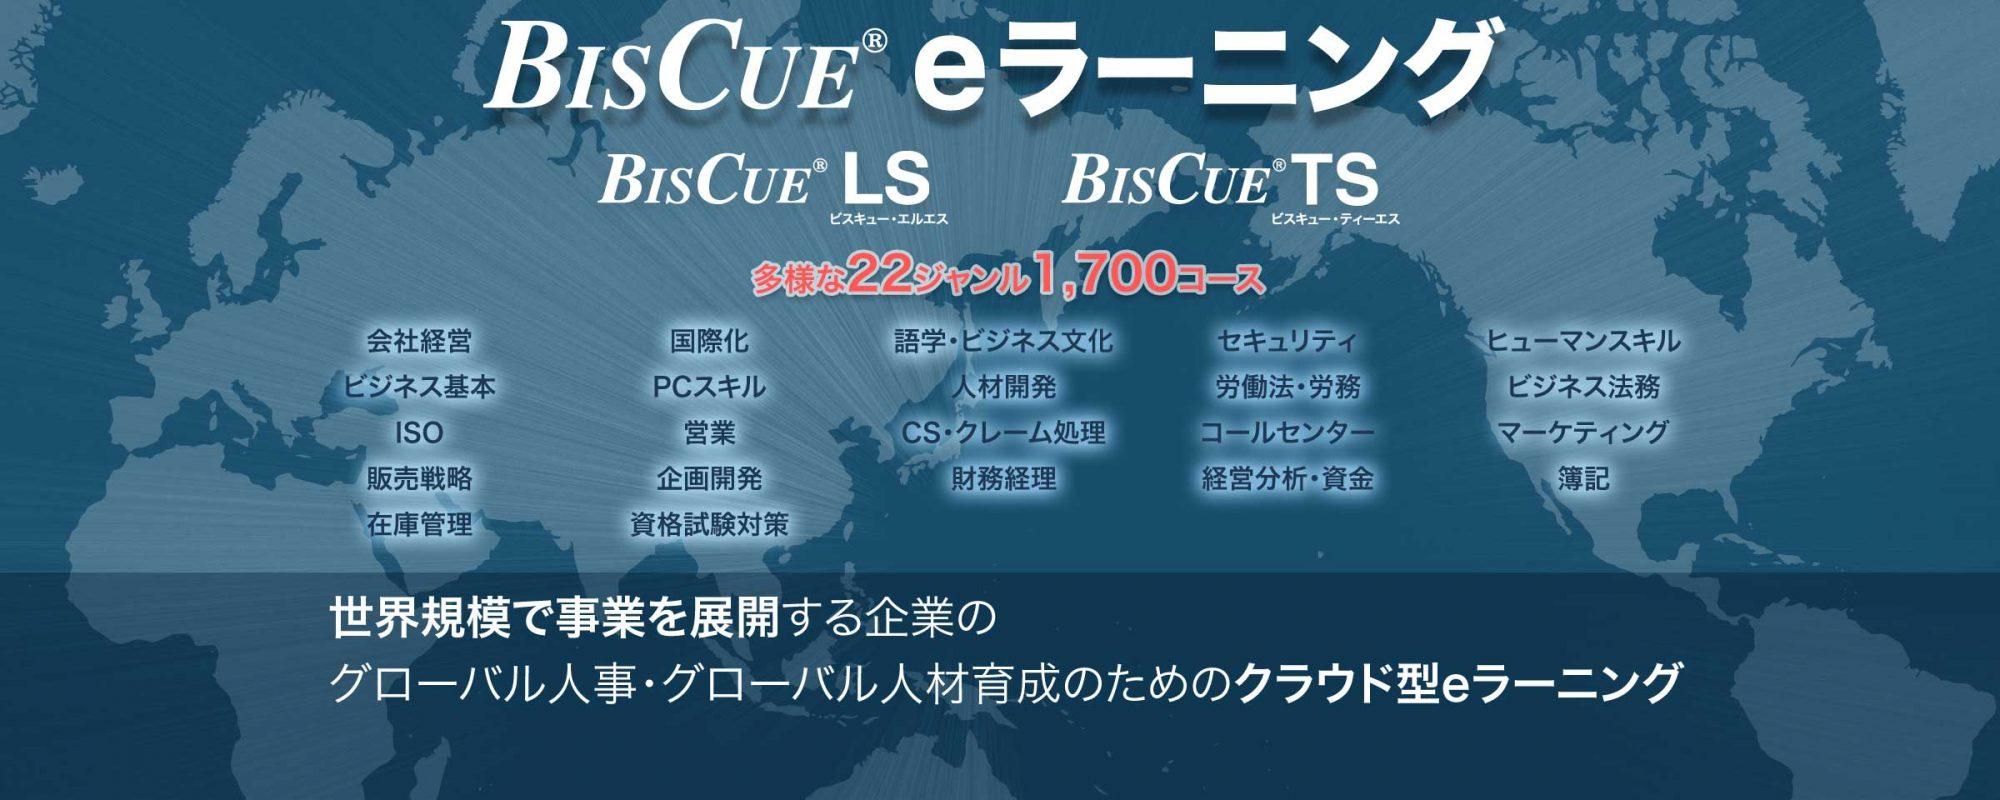 BISCUE eラーニング 世界規模で事業を展開する企業のグローバル人事・グローバル人材育成のためのクラウド型eラーニング